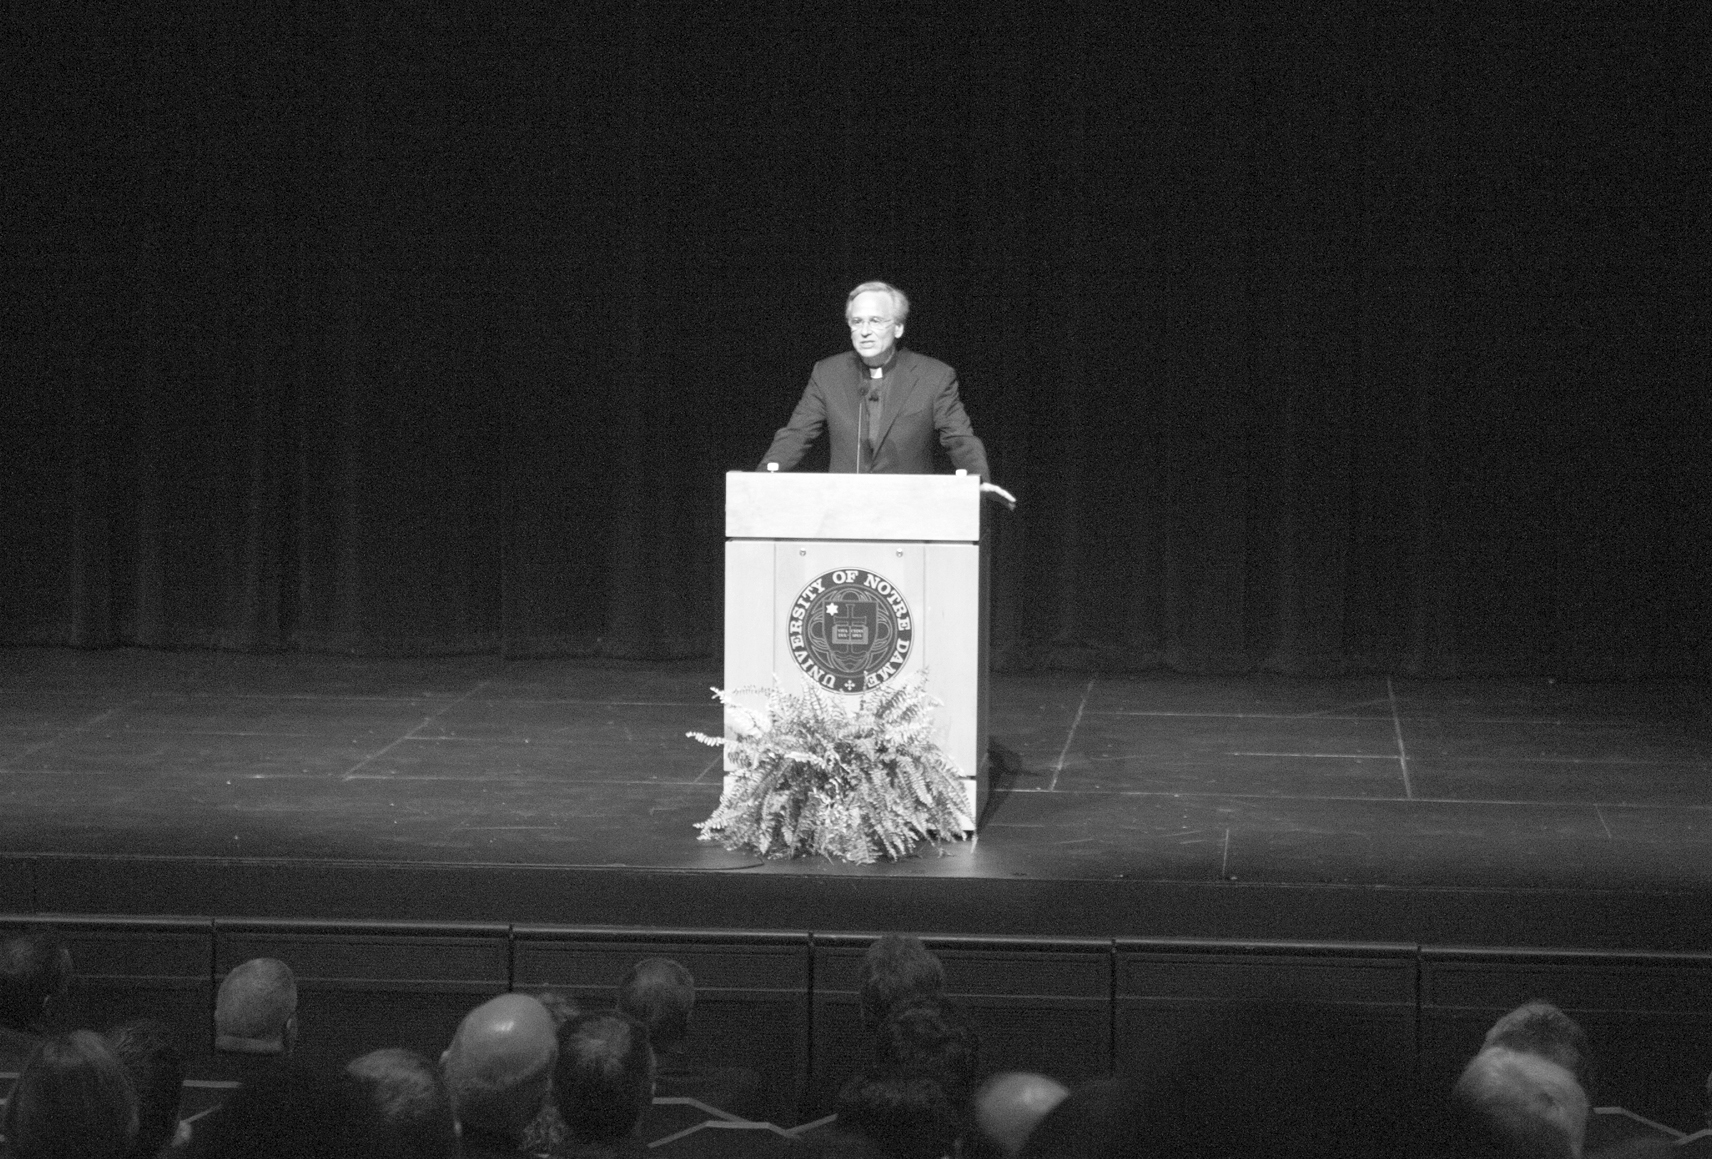 20150915, 20150915, Father Jenkins faculty address, Rosie LoVoi